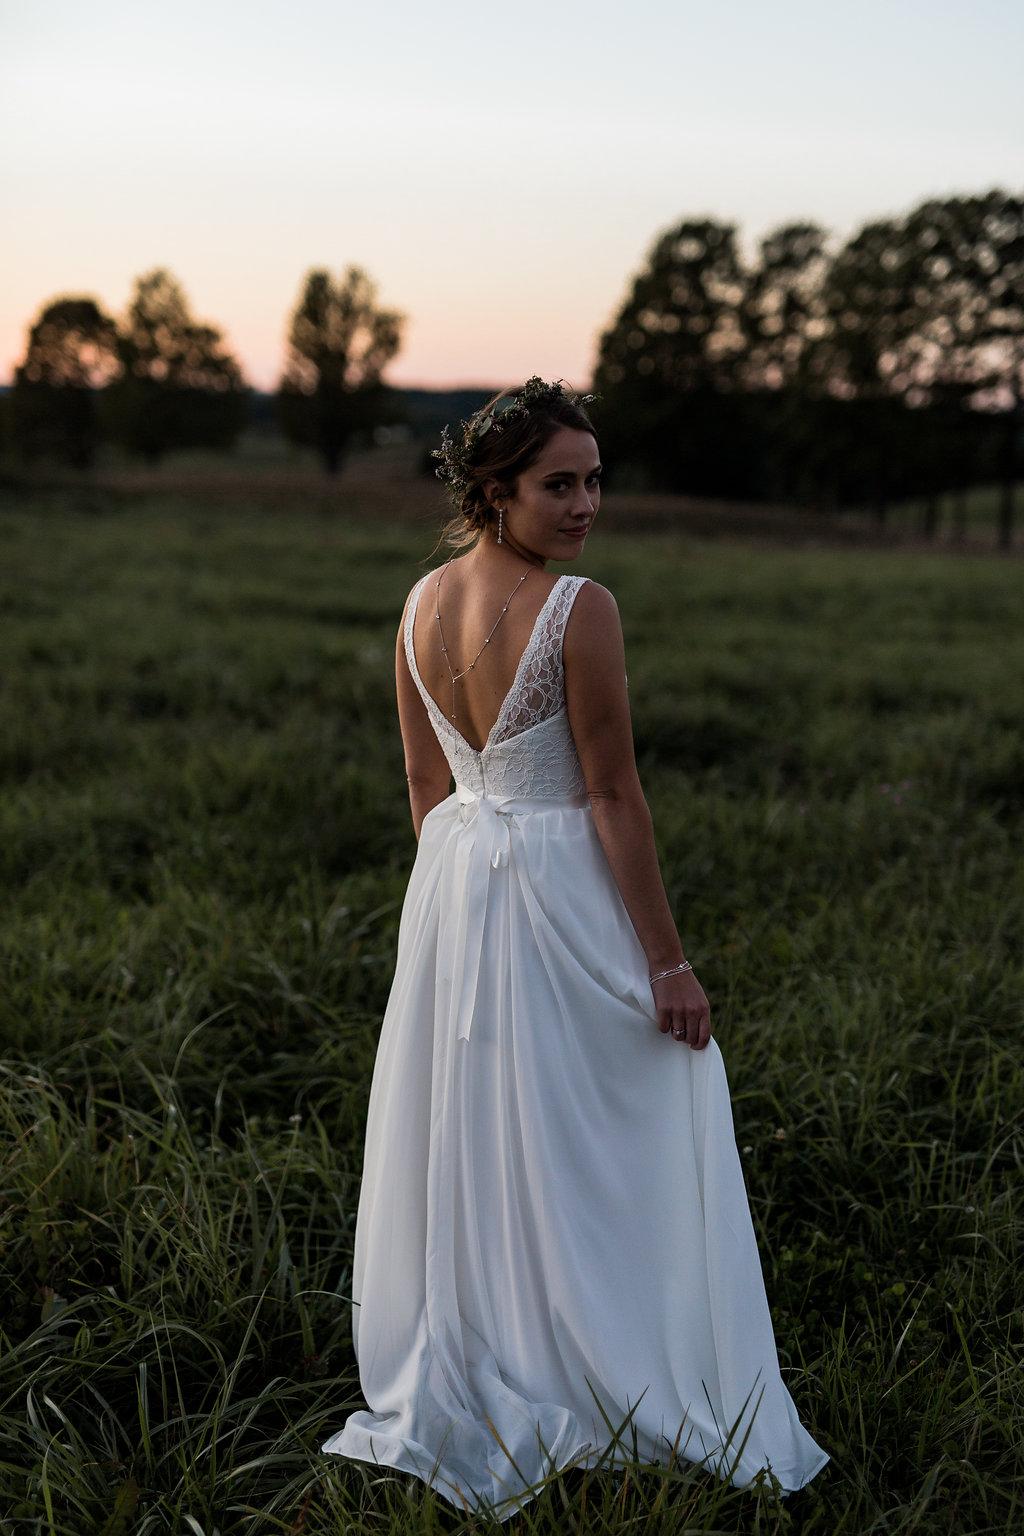 Sonshine_barn_northern_michigan_wedding_-109.jpg